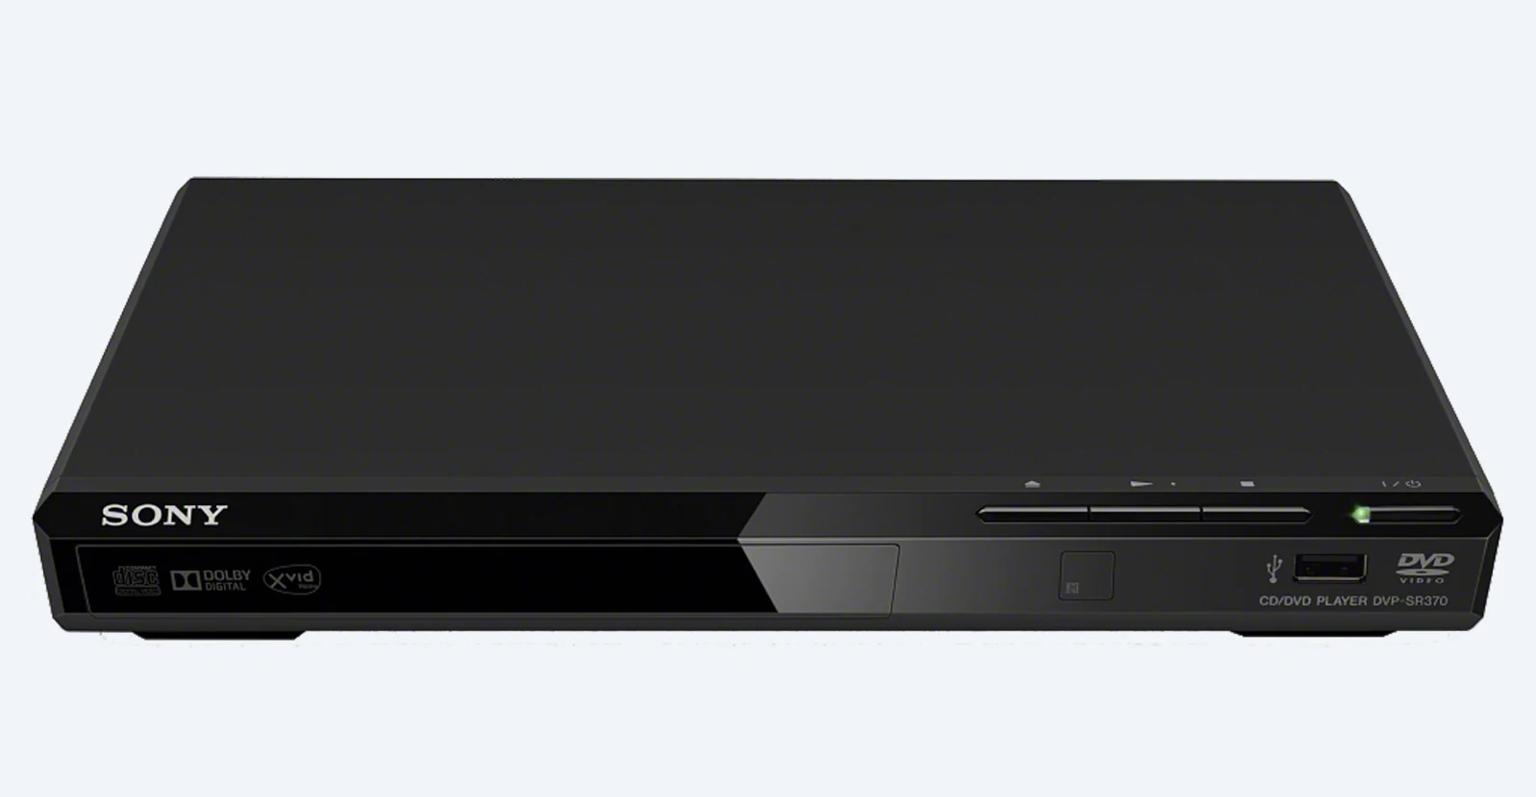 Sony DVP-SR370 Multisystem DVD Player Tanzania - Black